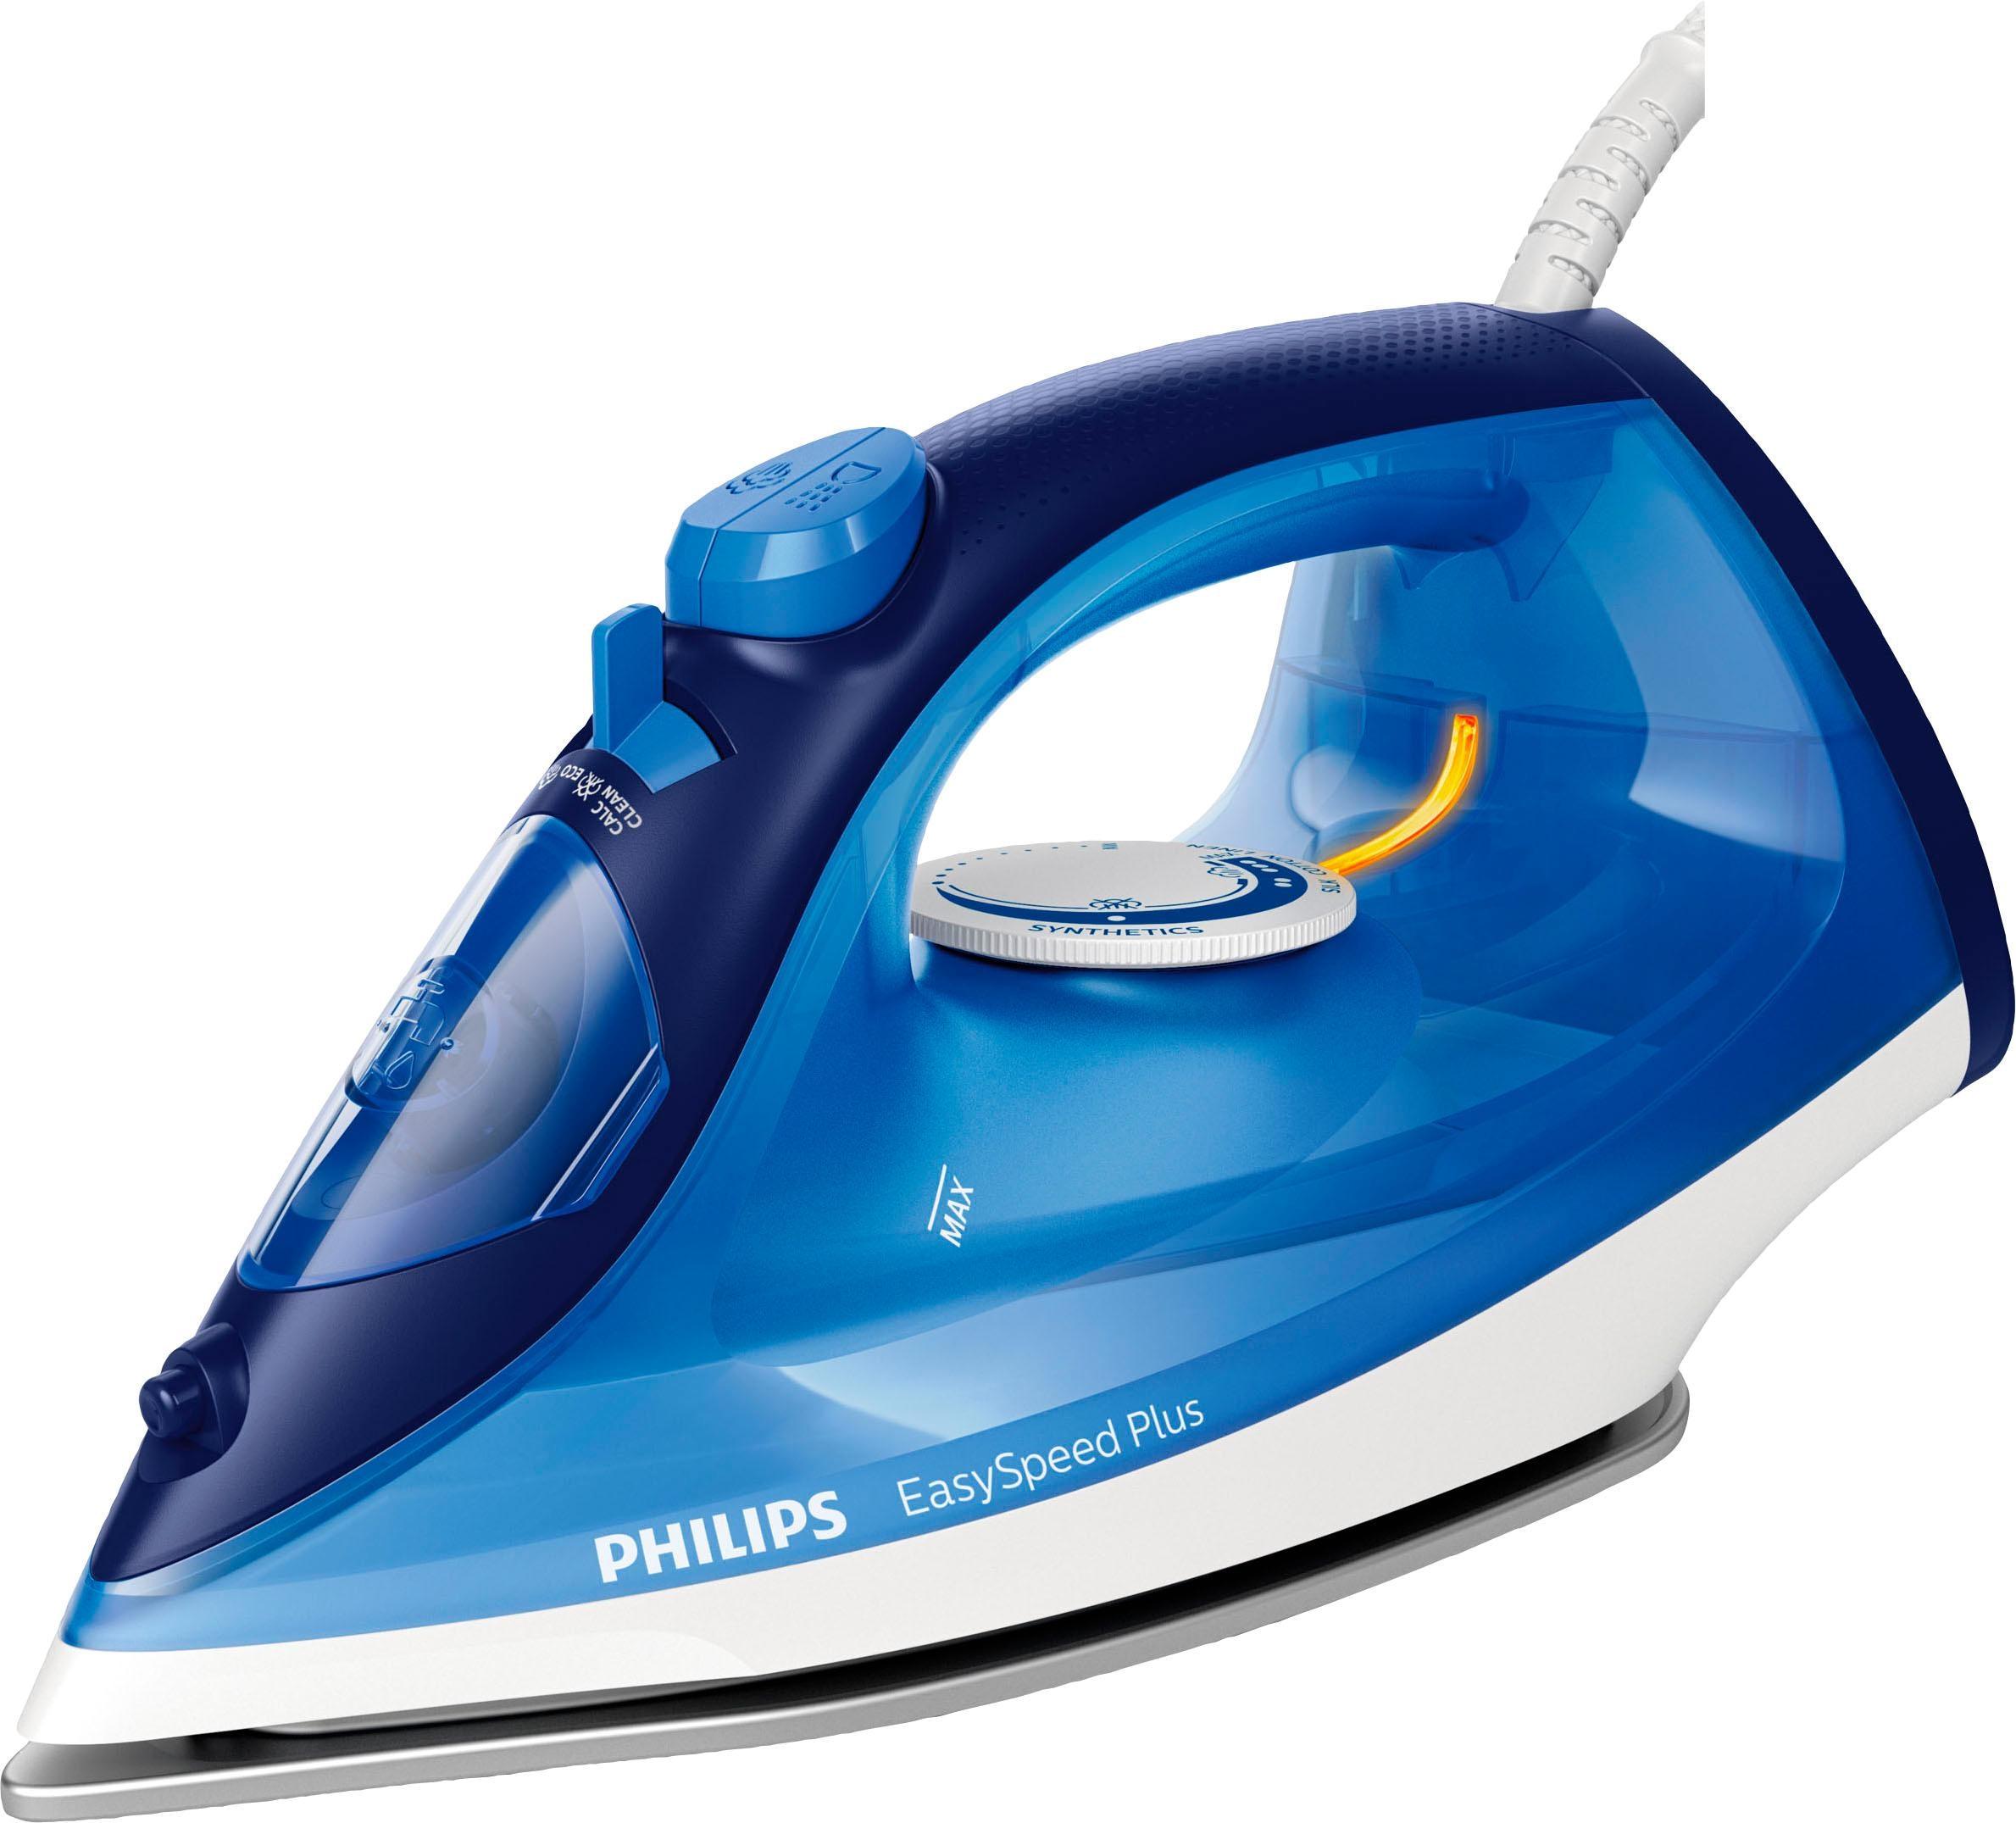 Philips Dampfbügeleisen EasySpeed Plus GC2145/20, 2100 Watt | Flur & Diele > Haushaltsgeräte > Bügeleisen | Philips